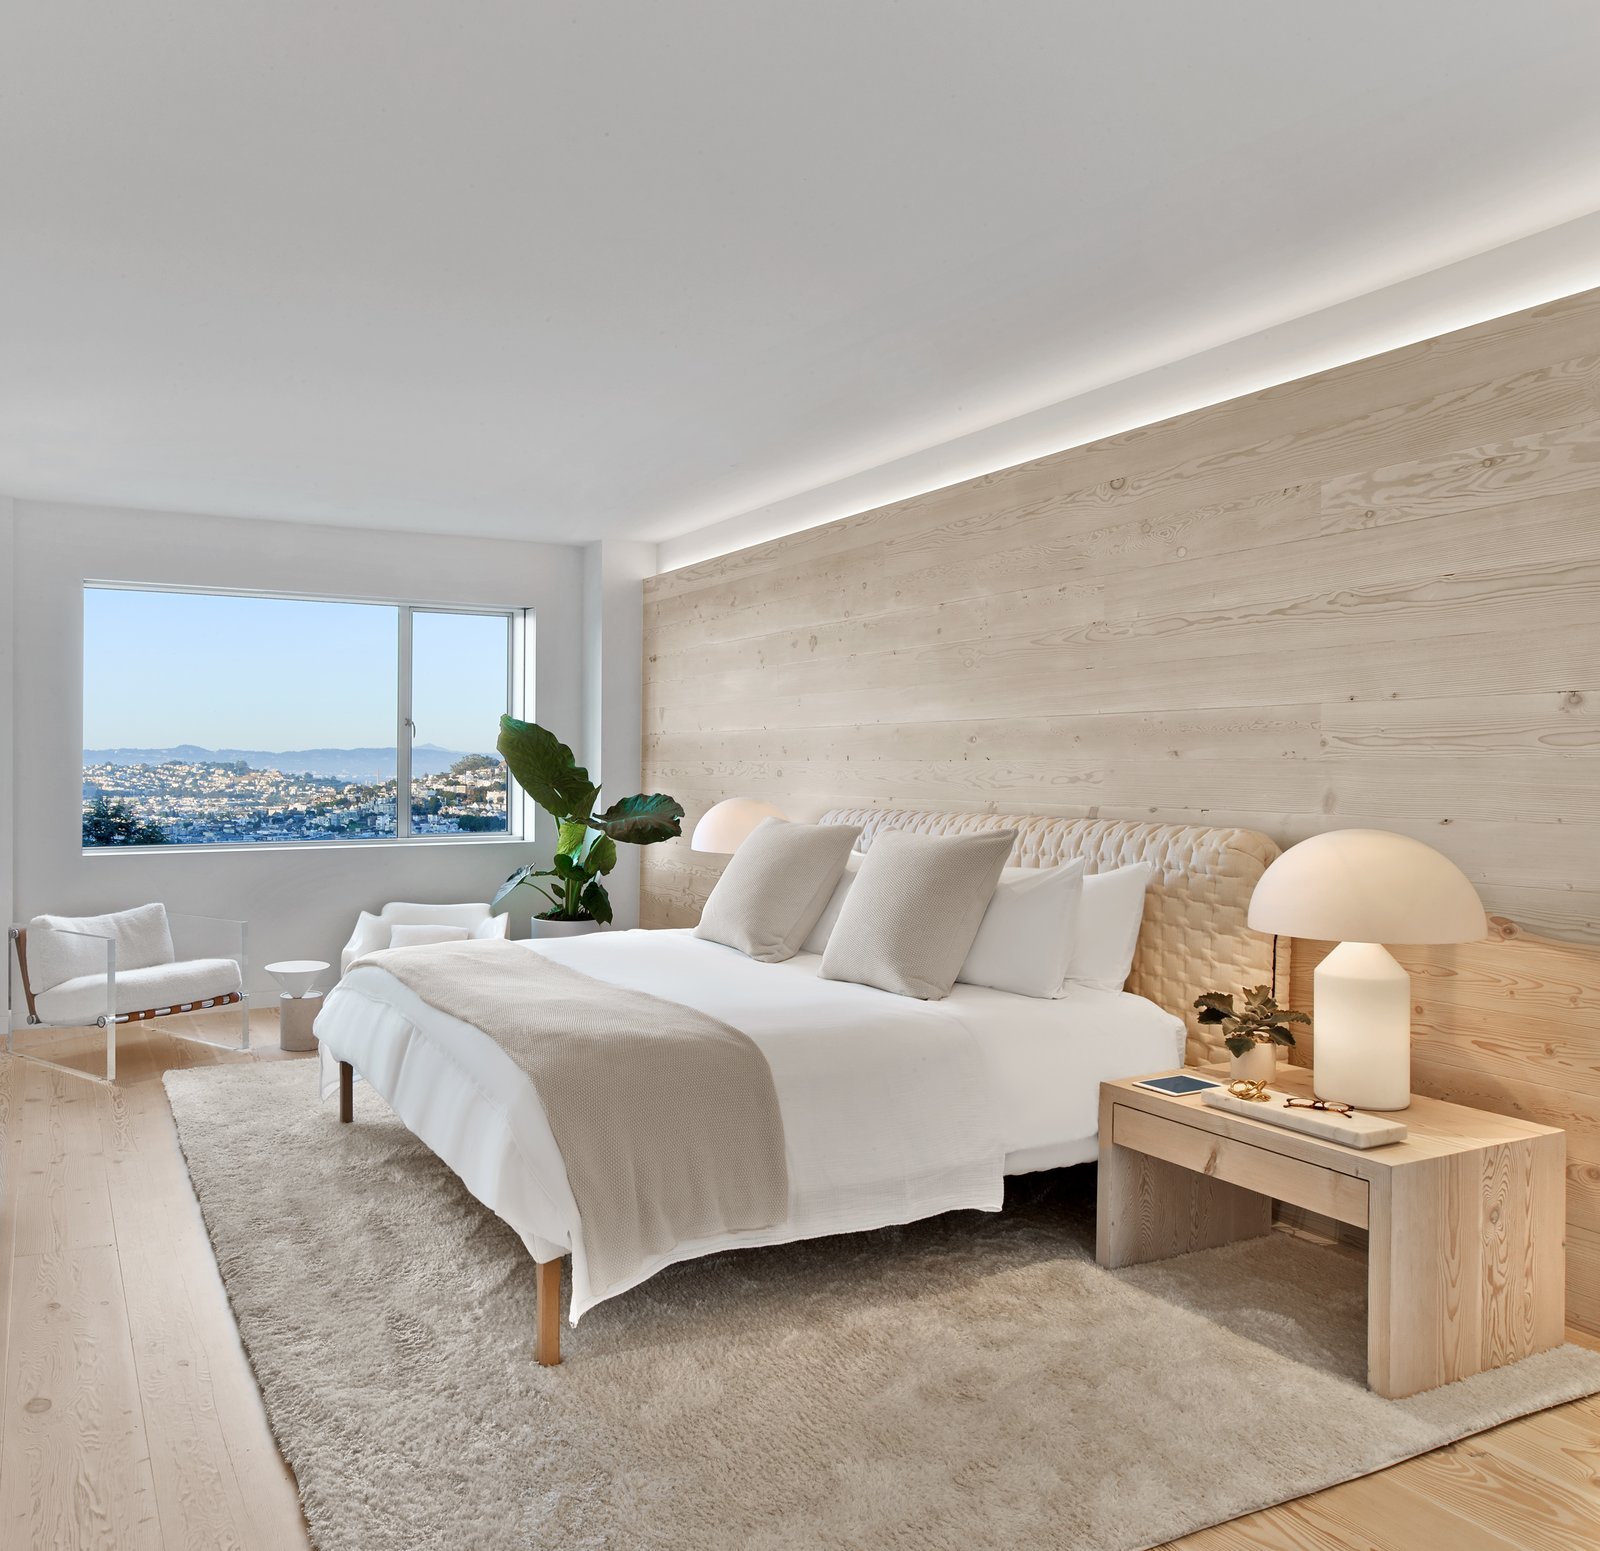 Bedroom, Bed, Table Lighting, Night Stands, Accent Lighting, Carpet Floor, and Light Hardwood Floor Master bedroom  Glen Park Residence by CCS ARCHITECTURE